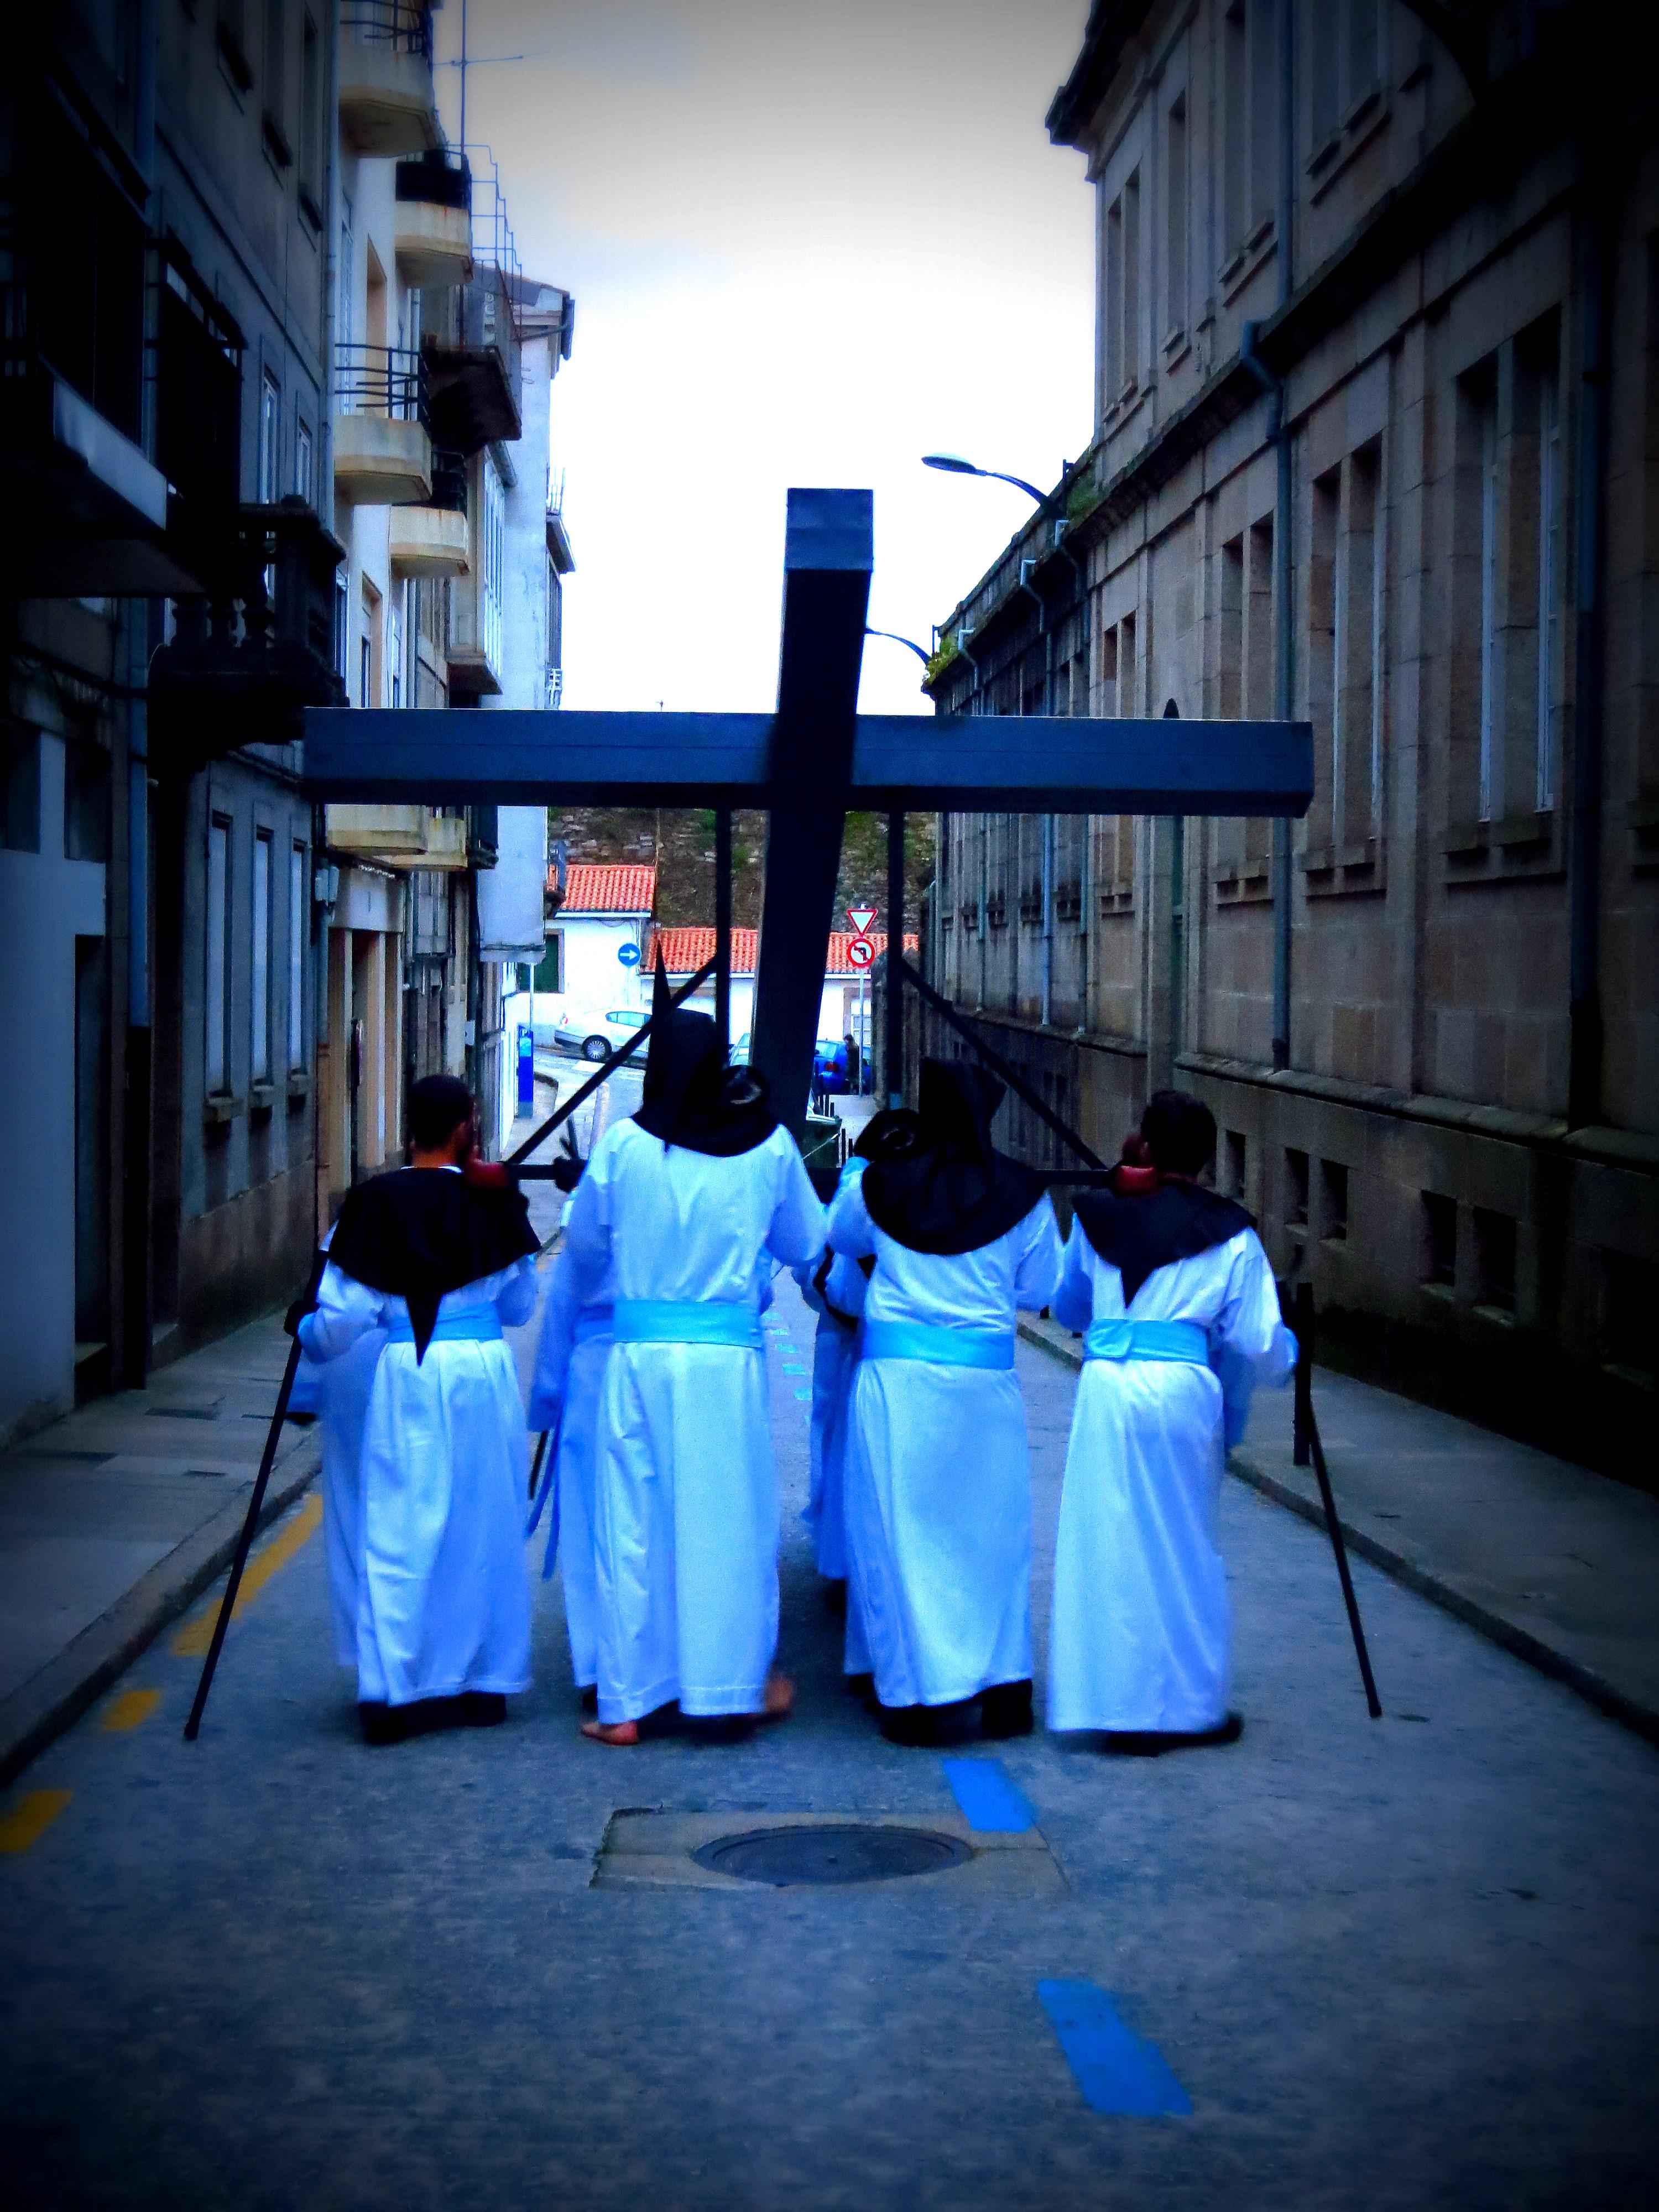 Procession, Spain